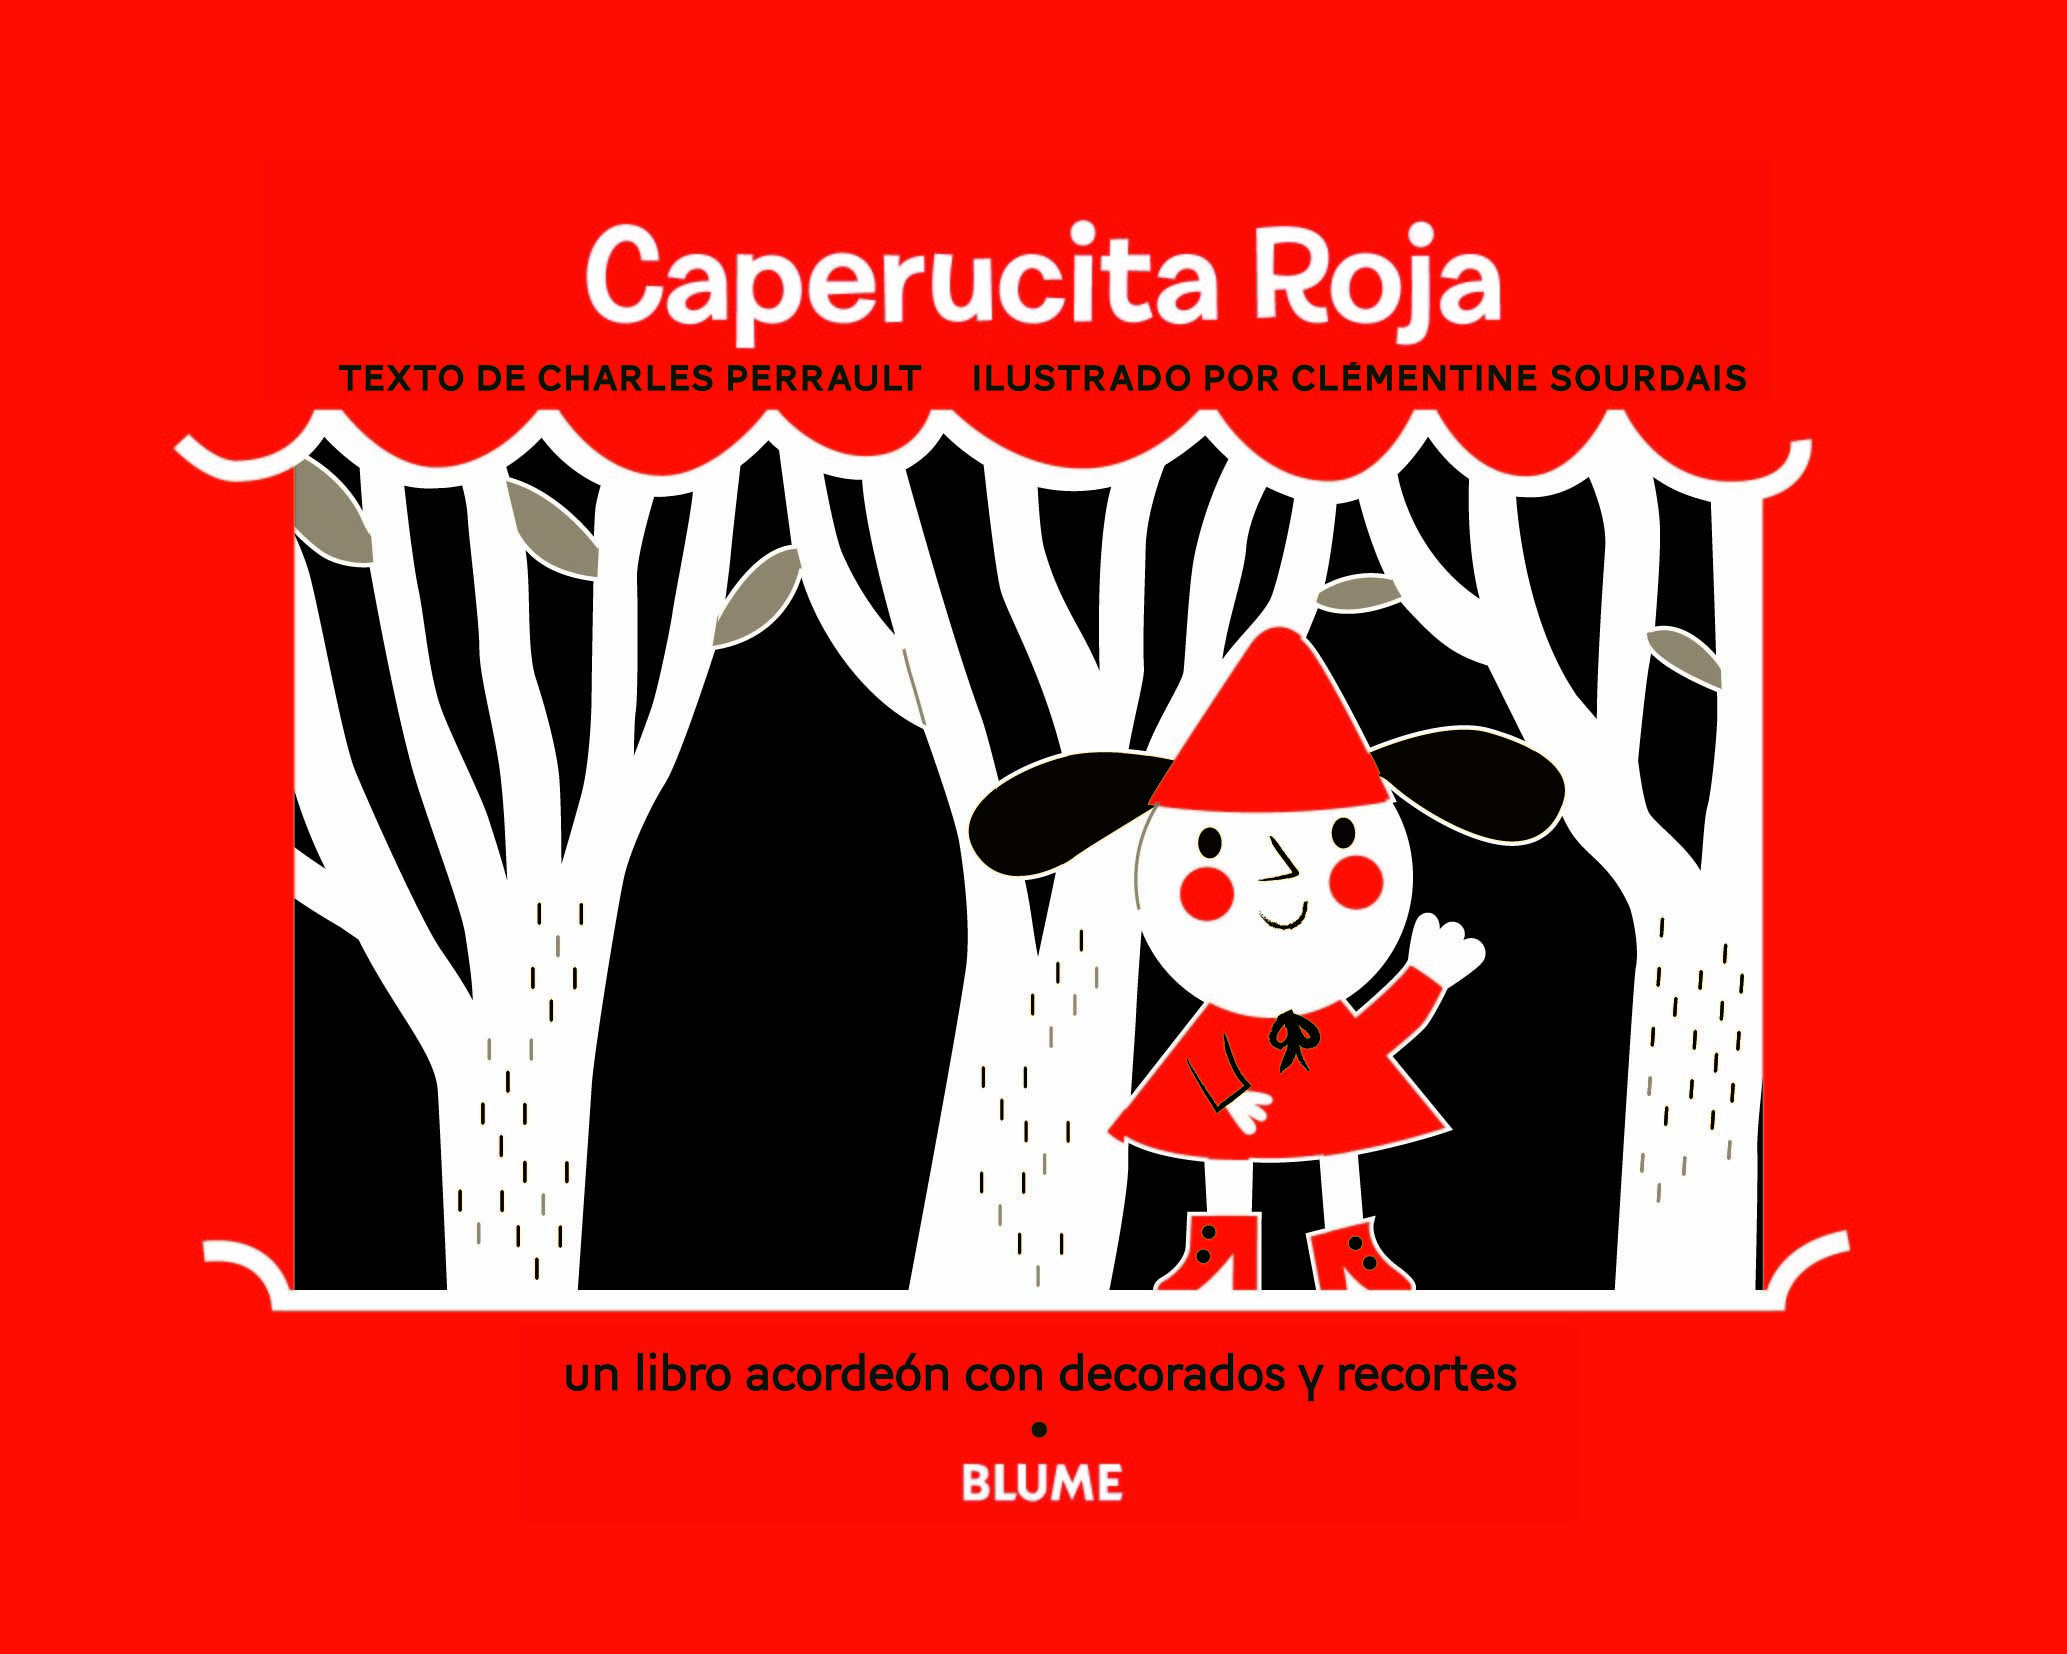 Nombre Caperucita Roja Version Porno caperucita roja | katakrak